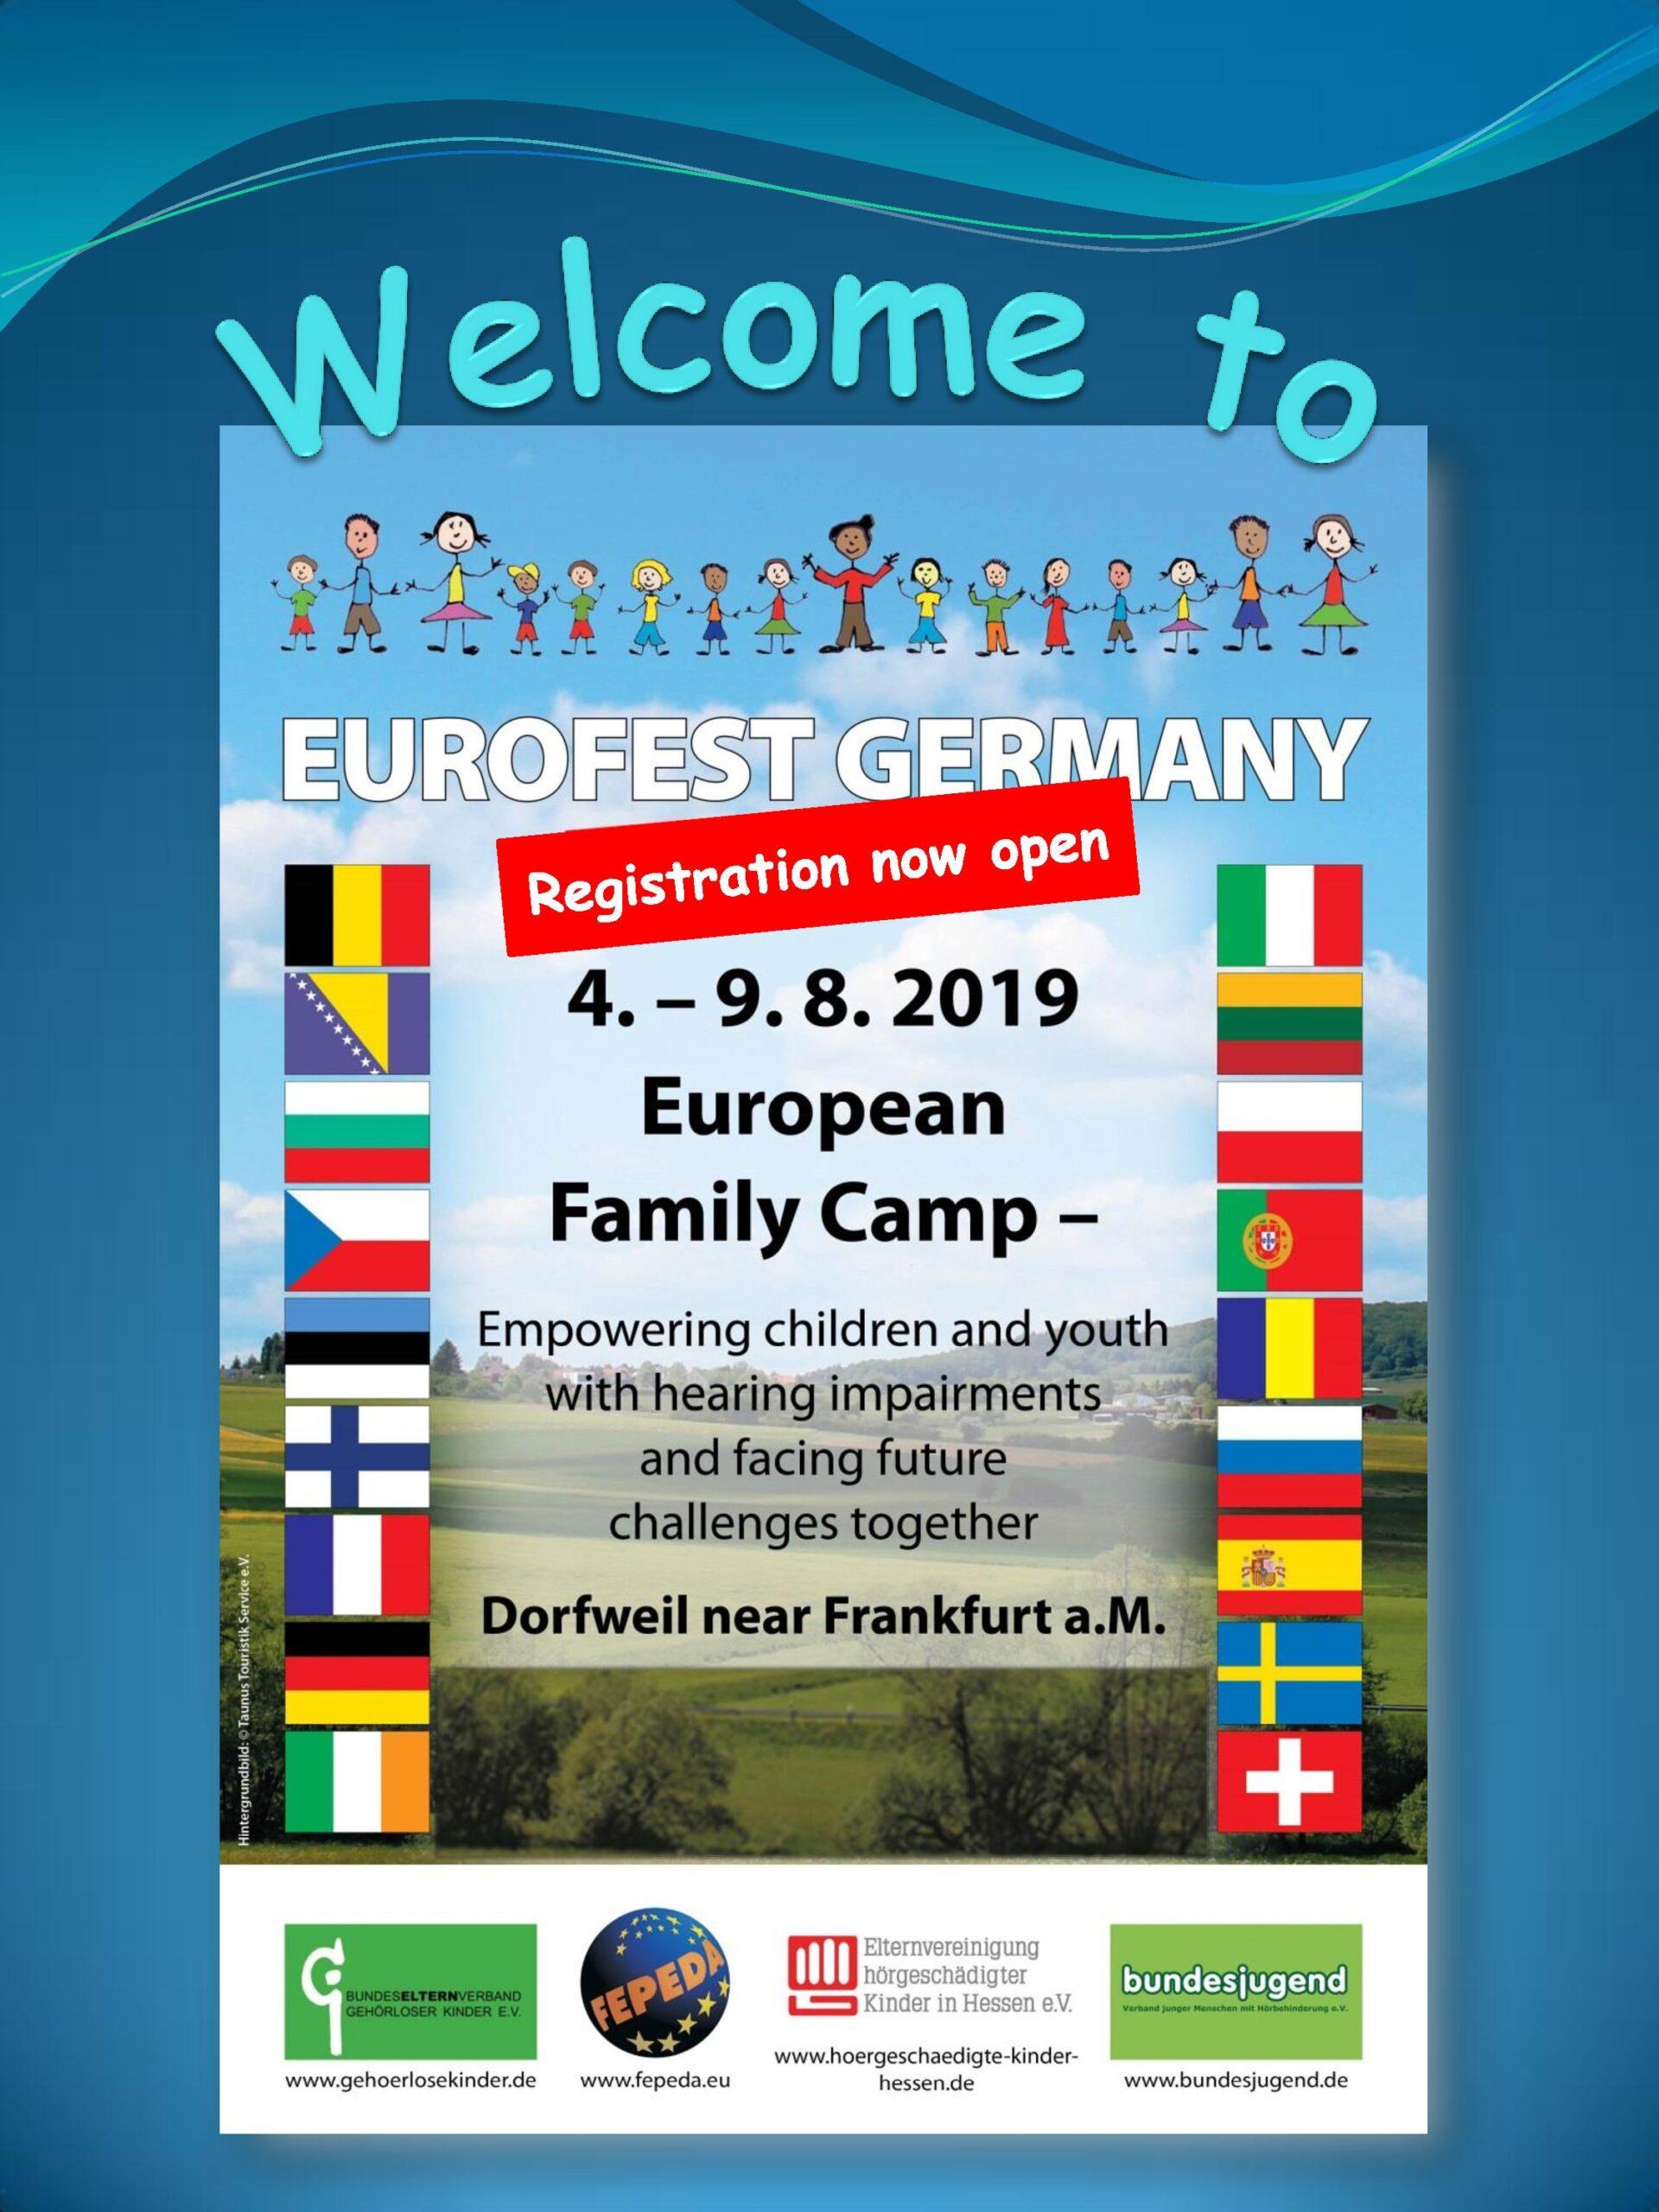 FEPEDA | Eurofest Germany 2020